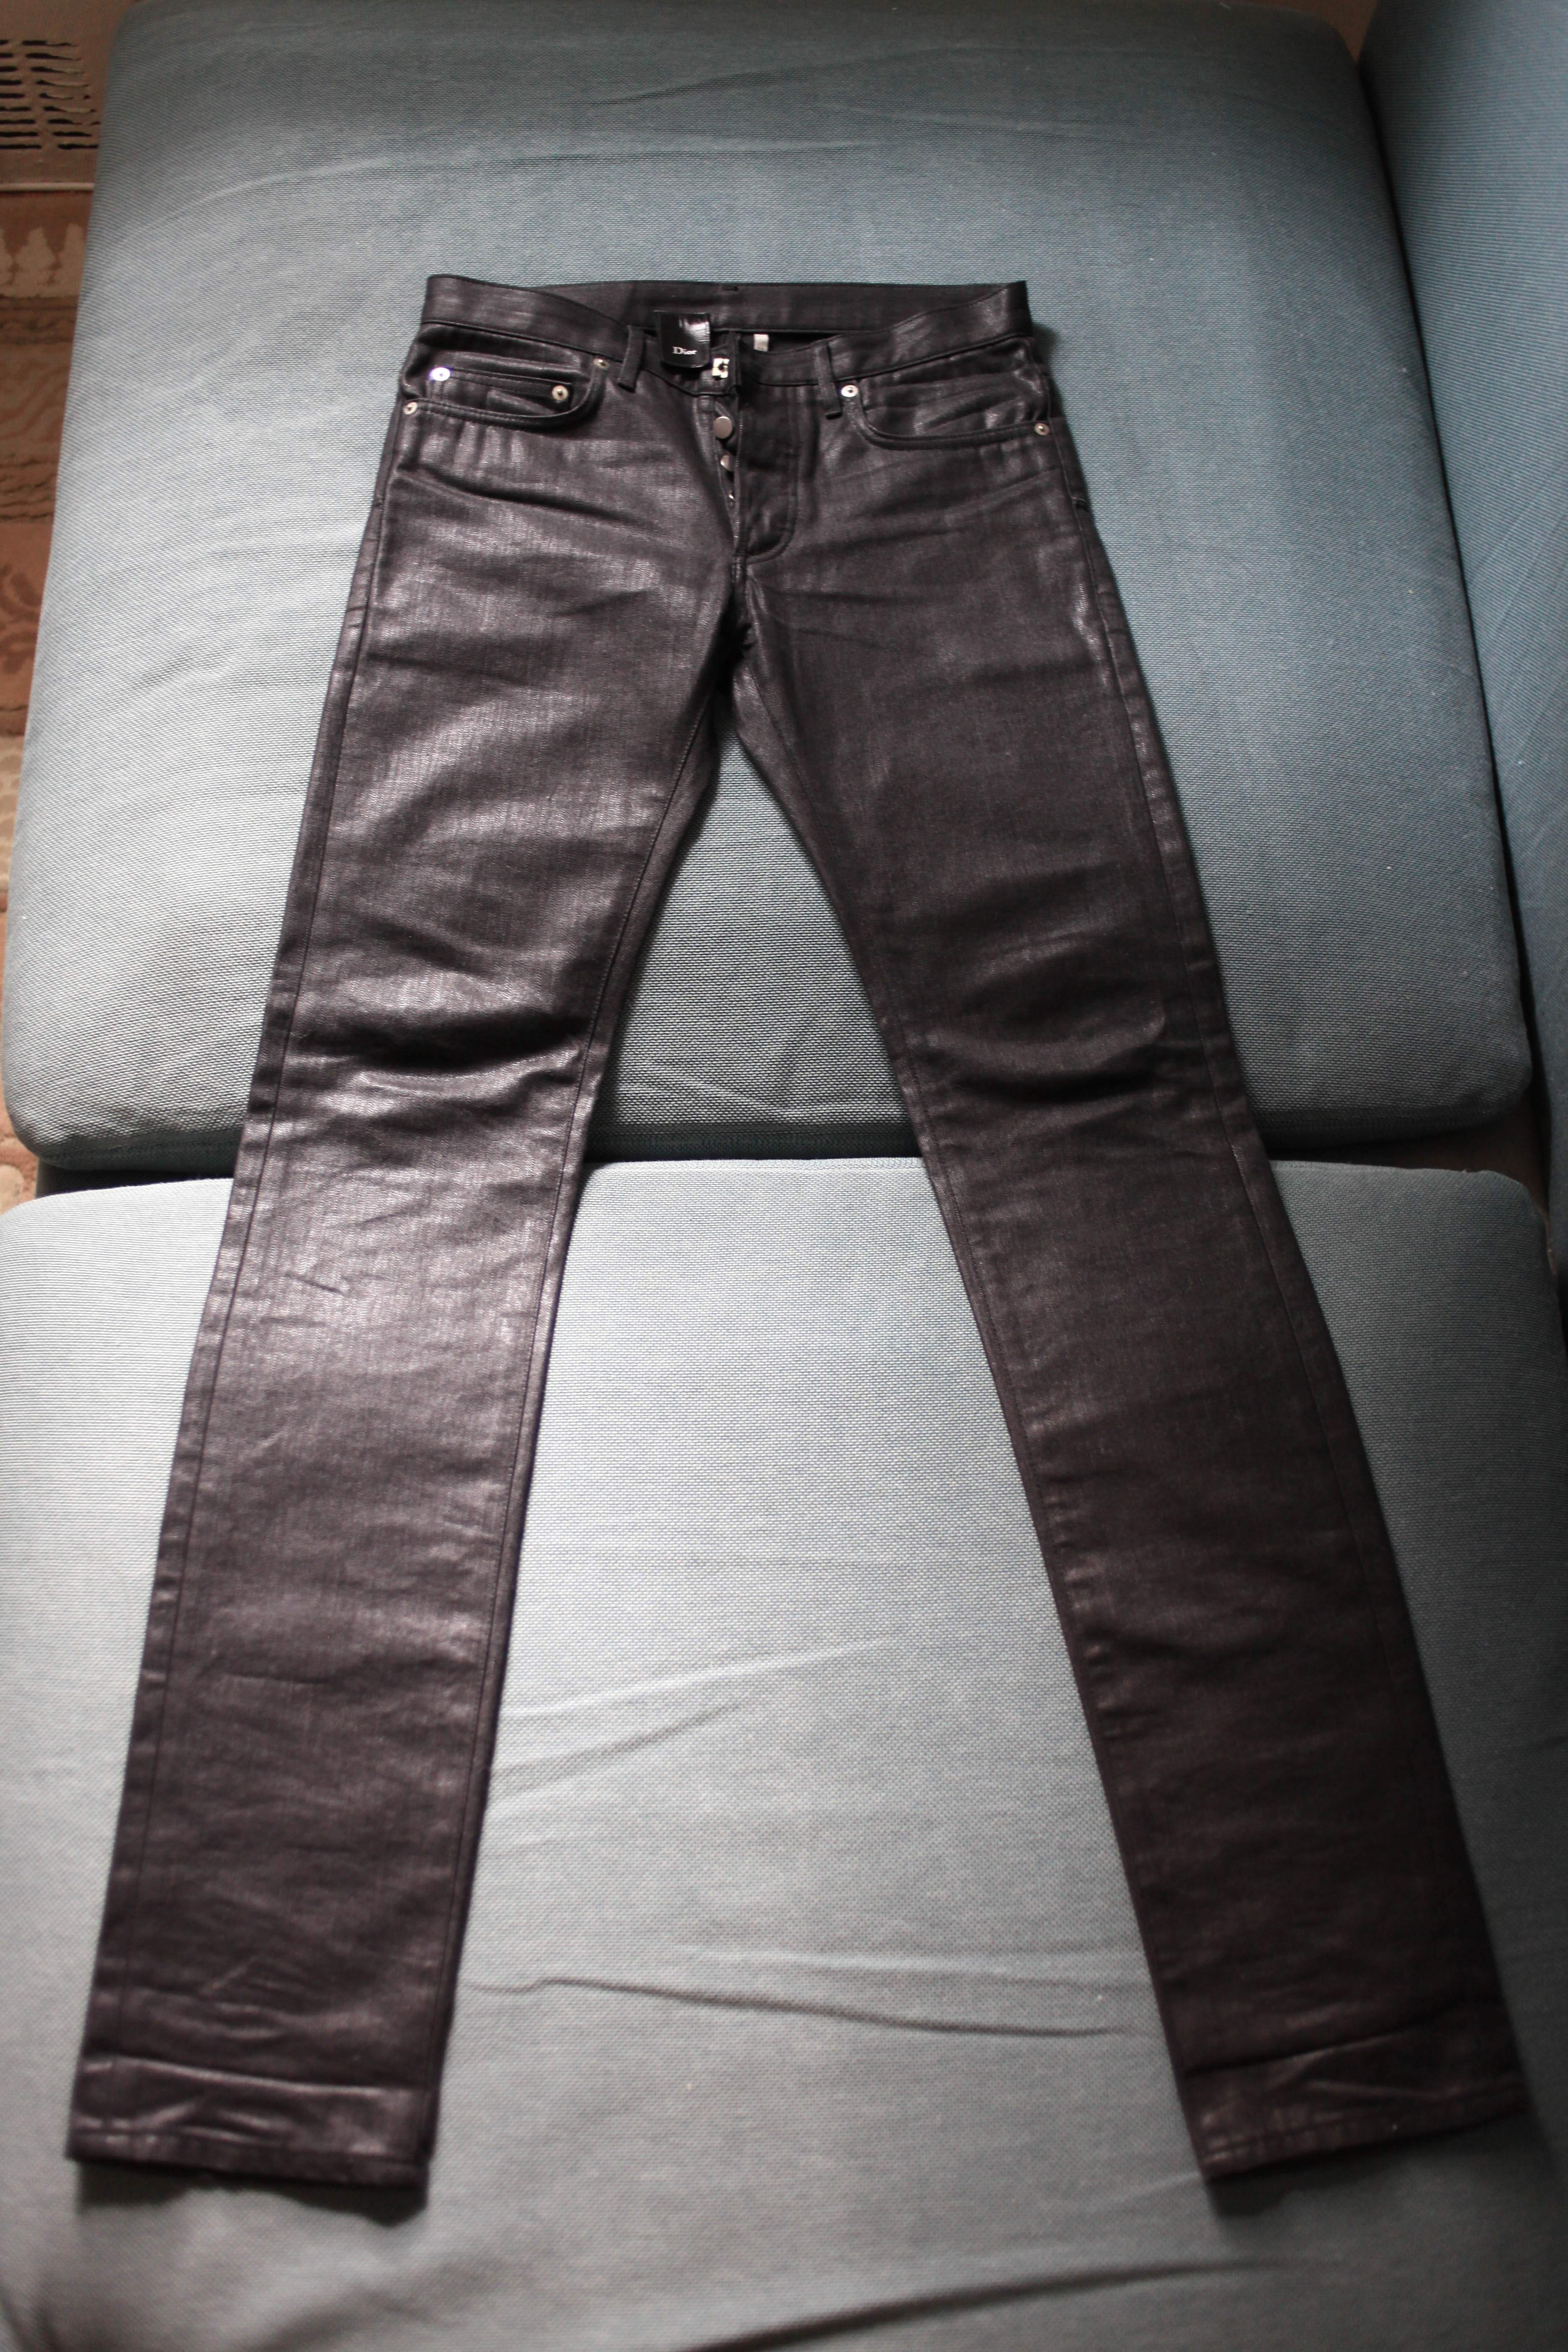 Dior Homme Sharp Notation Size 29 MIJ $550.